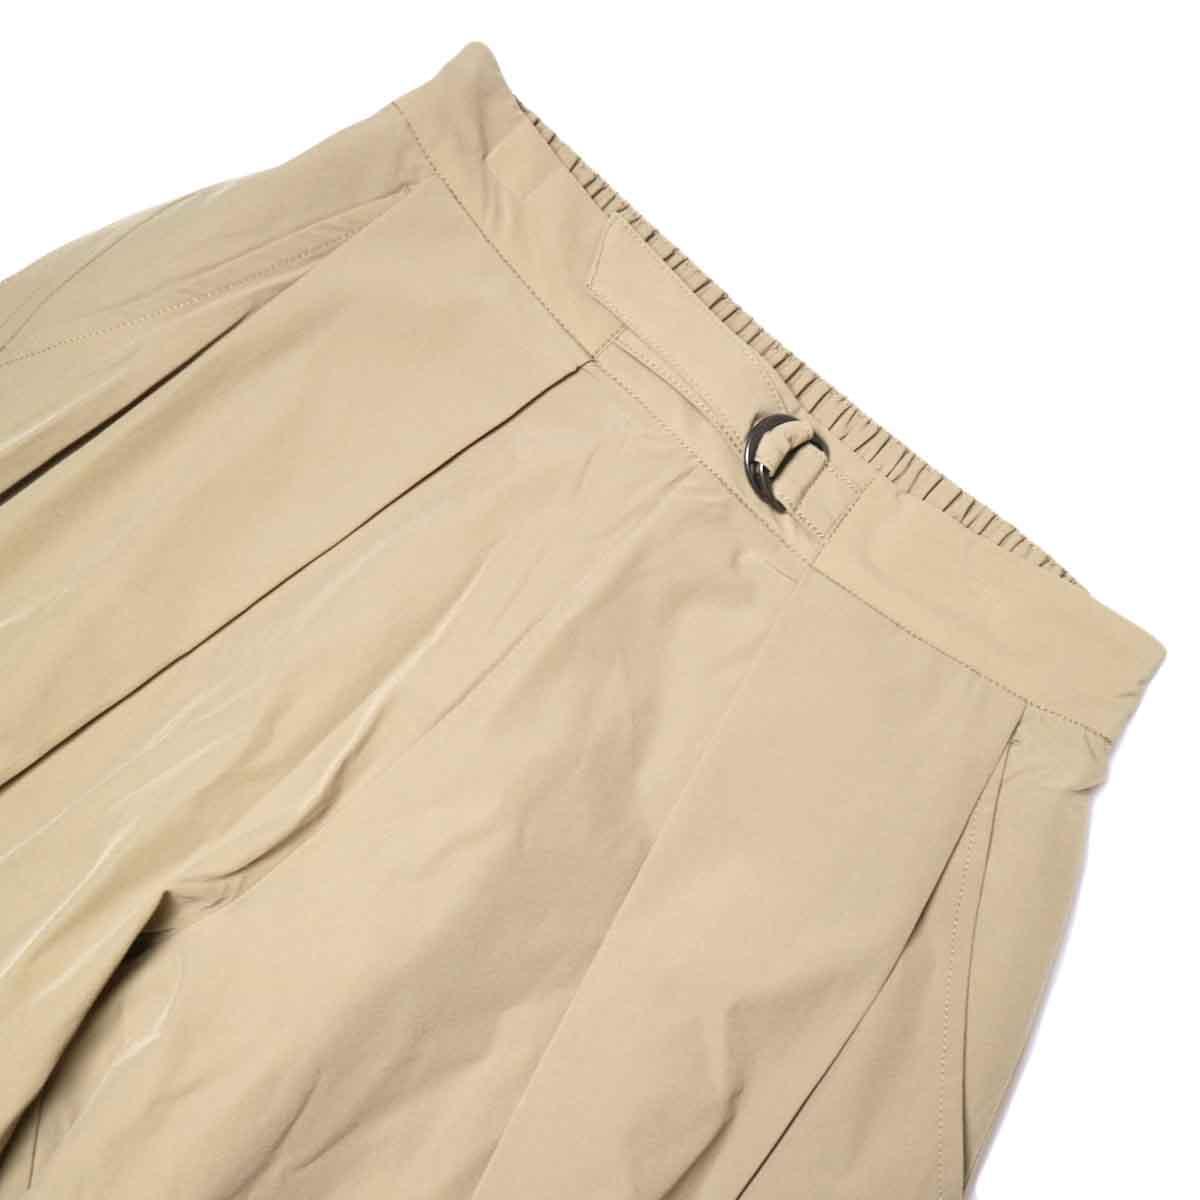 KHA:KI / SIDE WRAP BELTED PANTS (Beige) フロントアップ